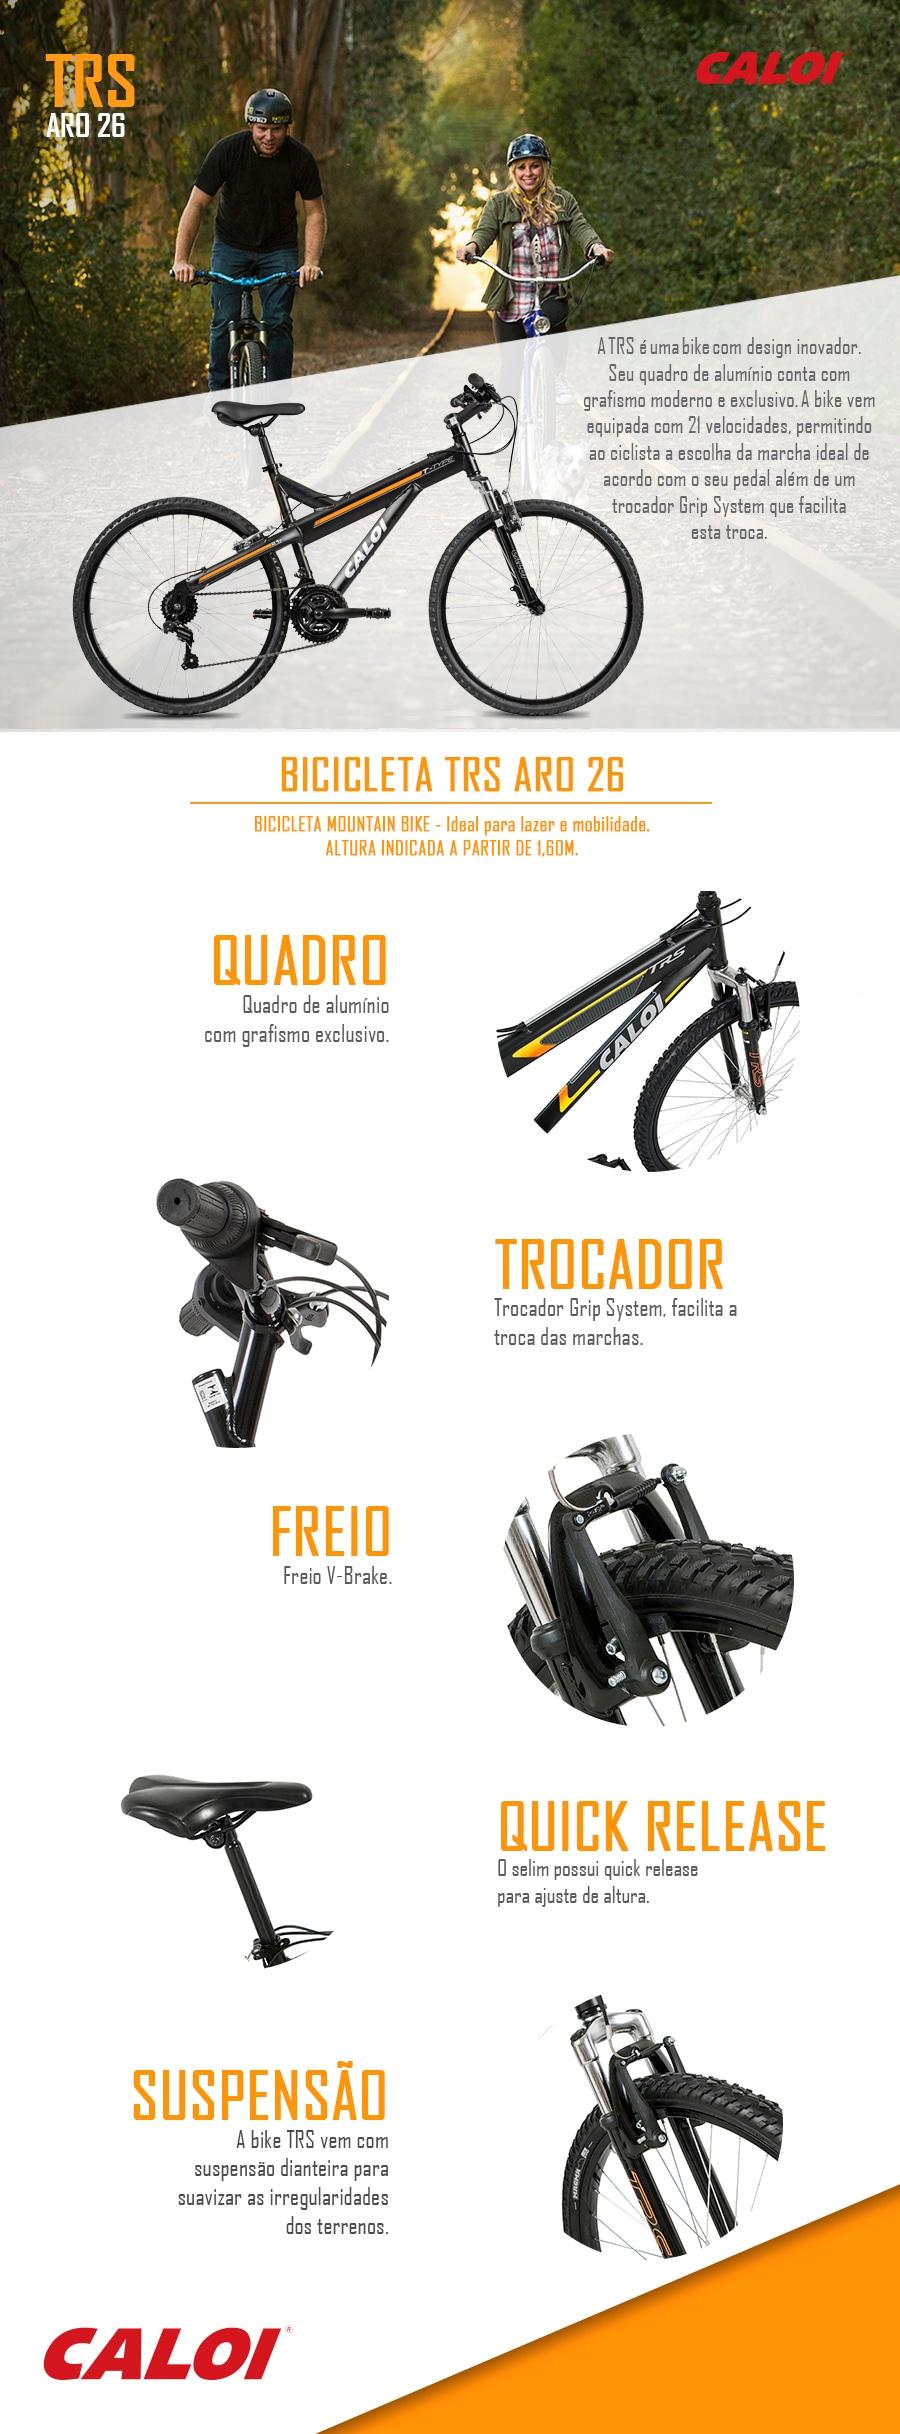 3ab5c0cd4 Bicicleta Caloi TRS - Aro 26 - Freio V-Brake - Câmbio Traseiro Caloi ...